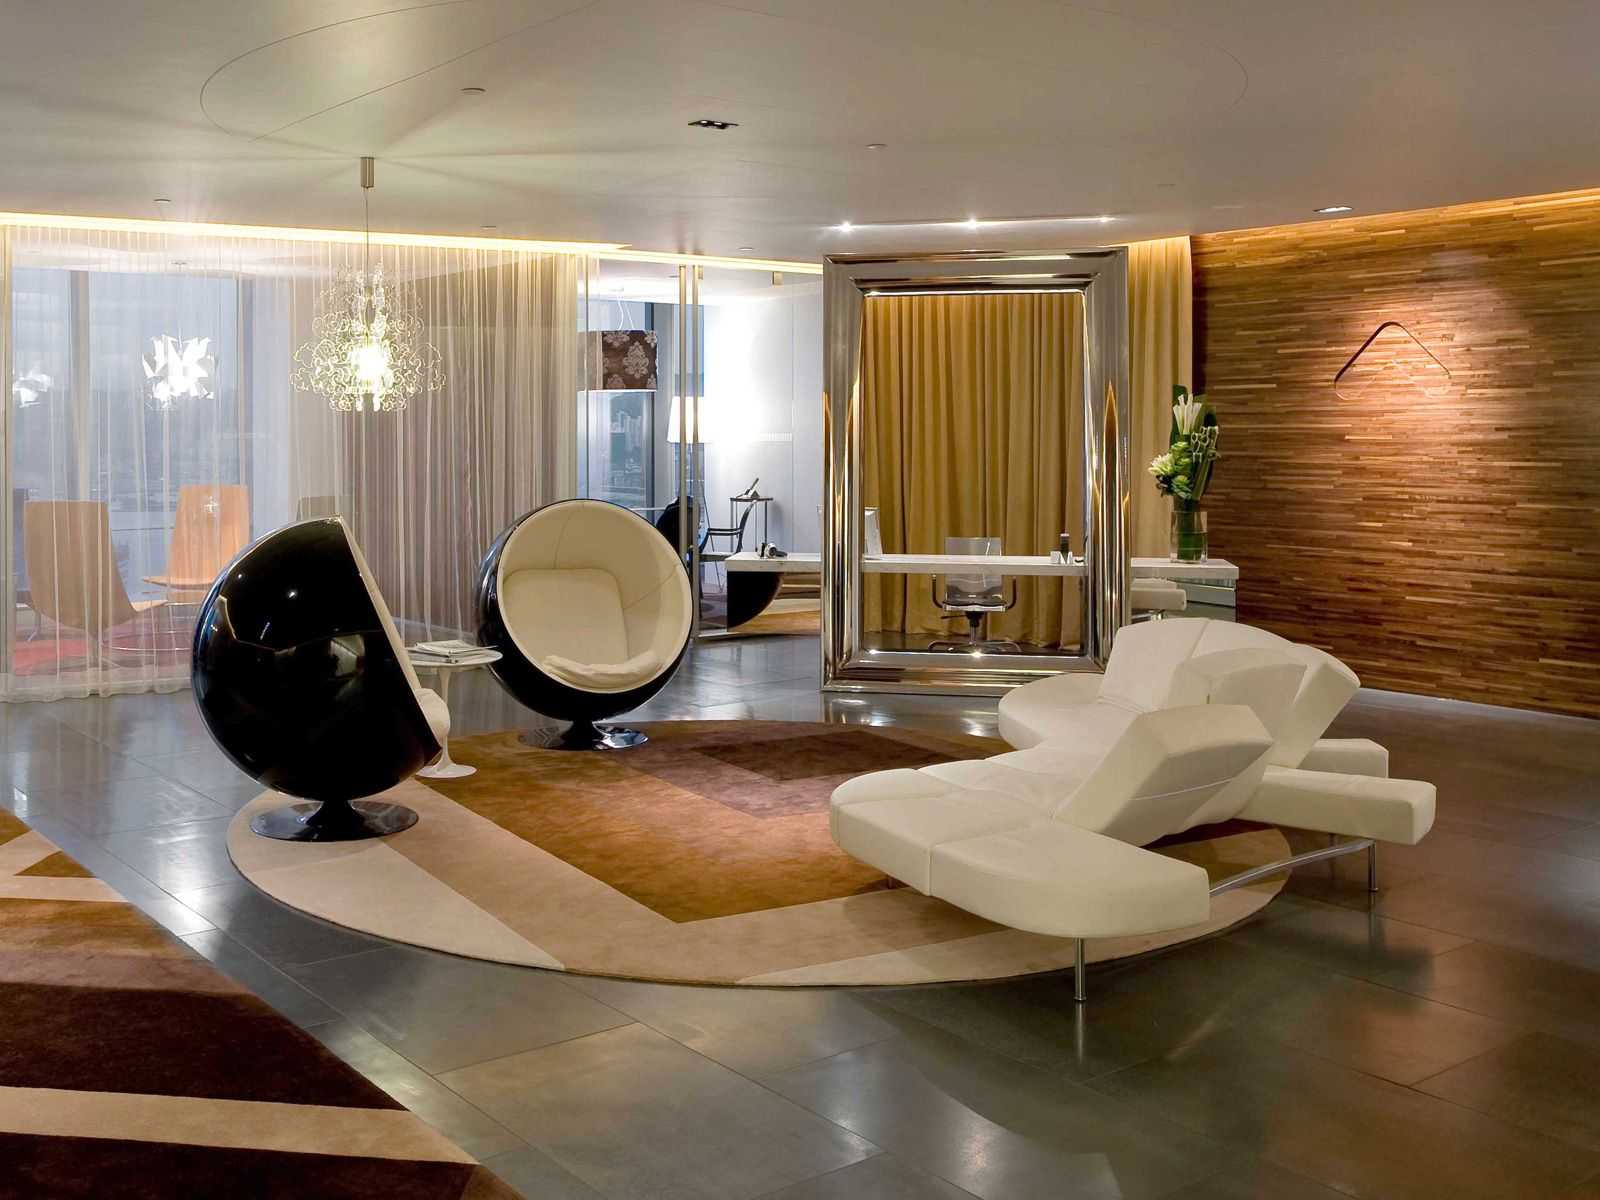 Interior design information - 10 interesting facts about interior design ...